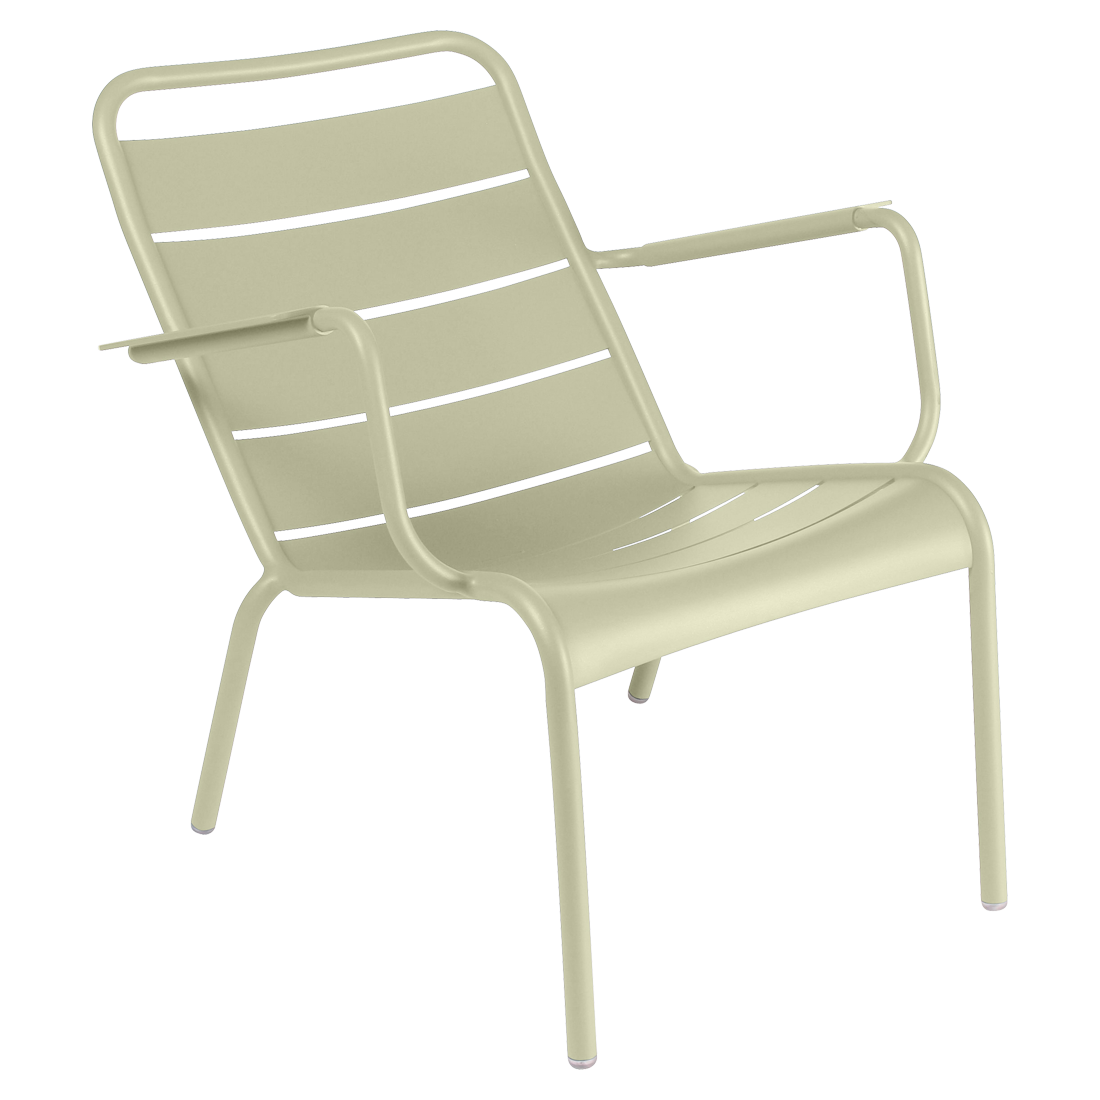 fauteuil luxembourg acier, fauteuil de terrasse, fauteuil terrasse hotel, fauteuil fermob vert